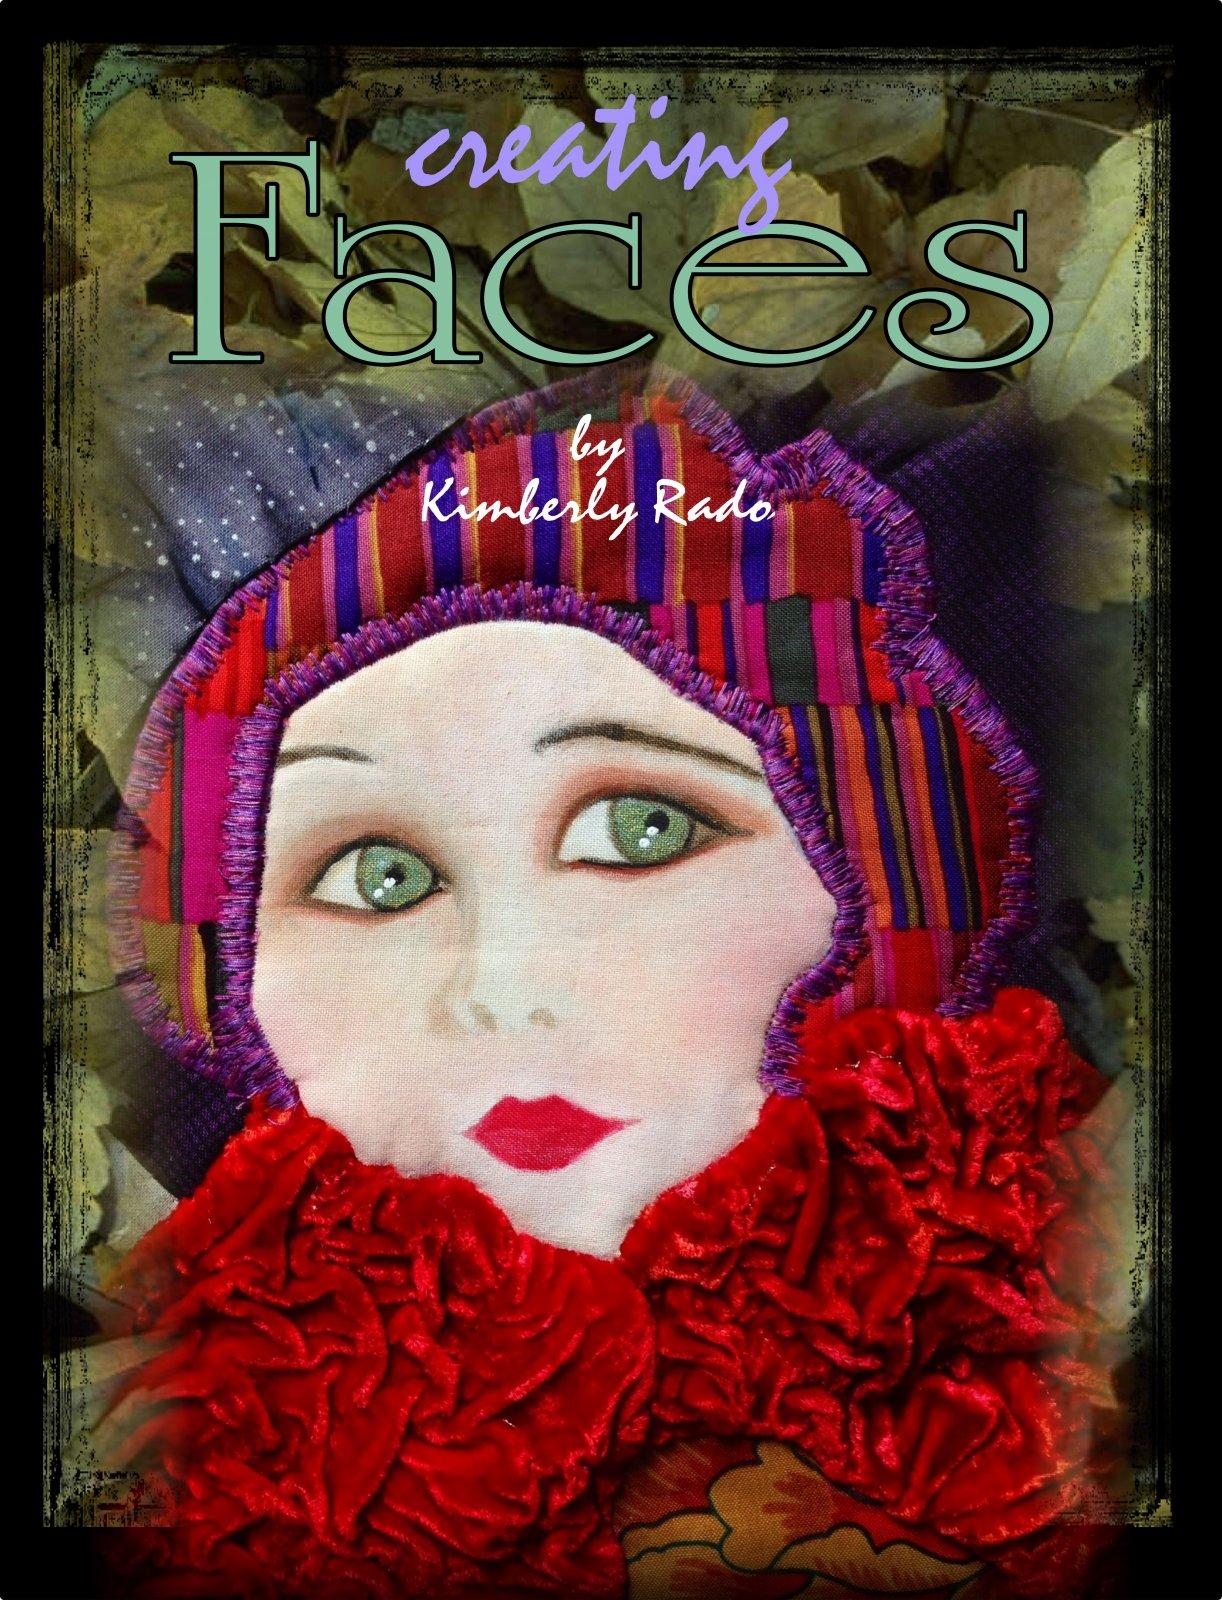 Creating Faces by Kimberly Rado